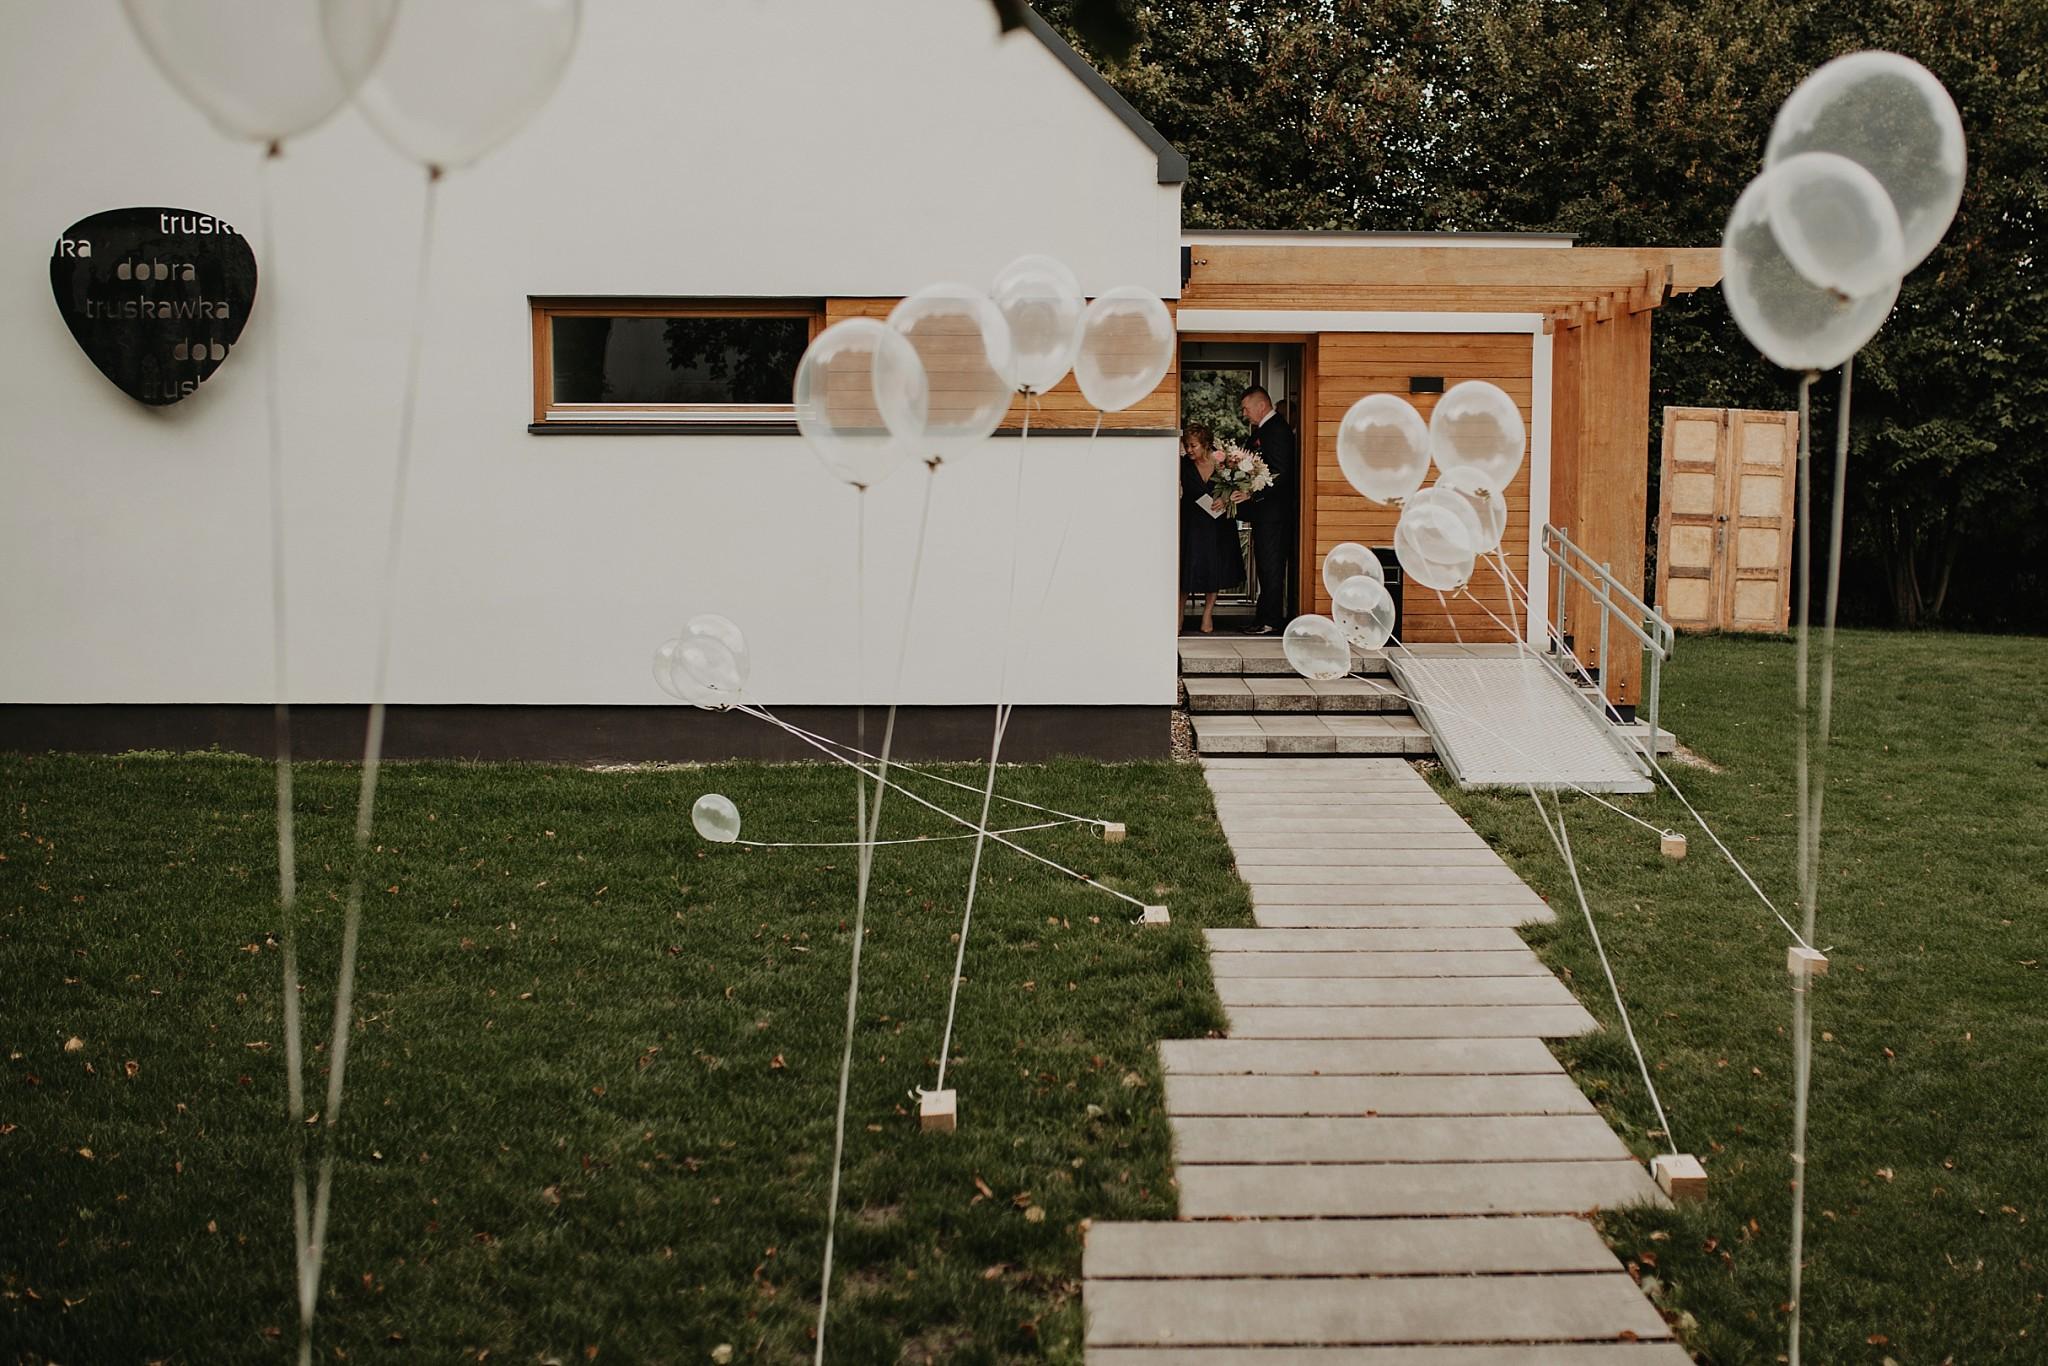 fotograf poznan wesele dobra truskawka piekne wesele pod poznaniem wesele w dobrej truskawce piekna para mloda slub marzen slub koronawirus slub listopad wesele koronawirus 087